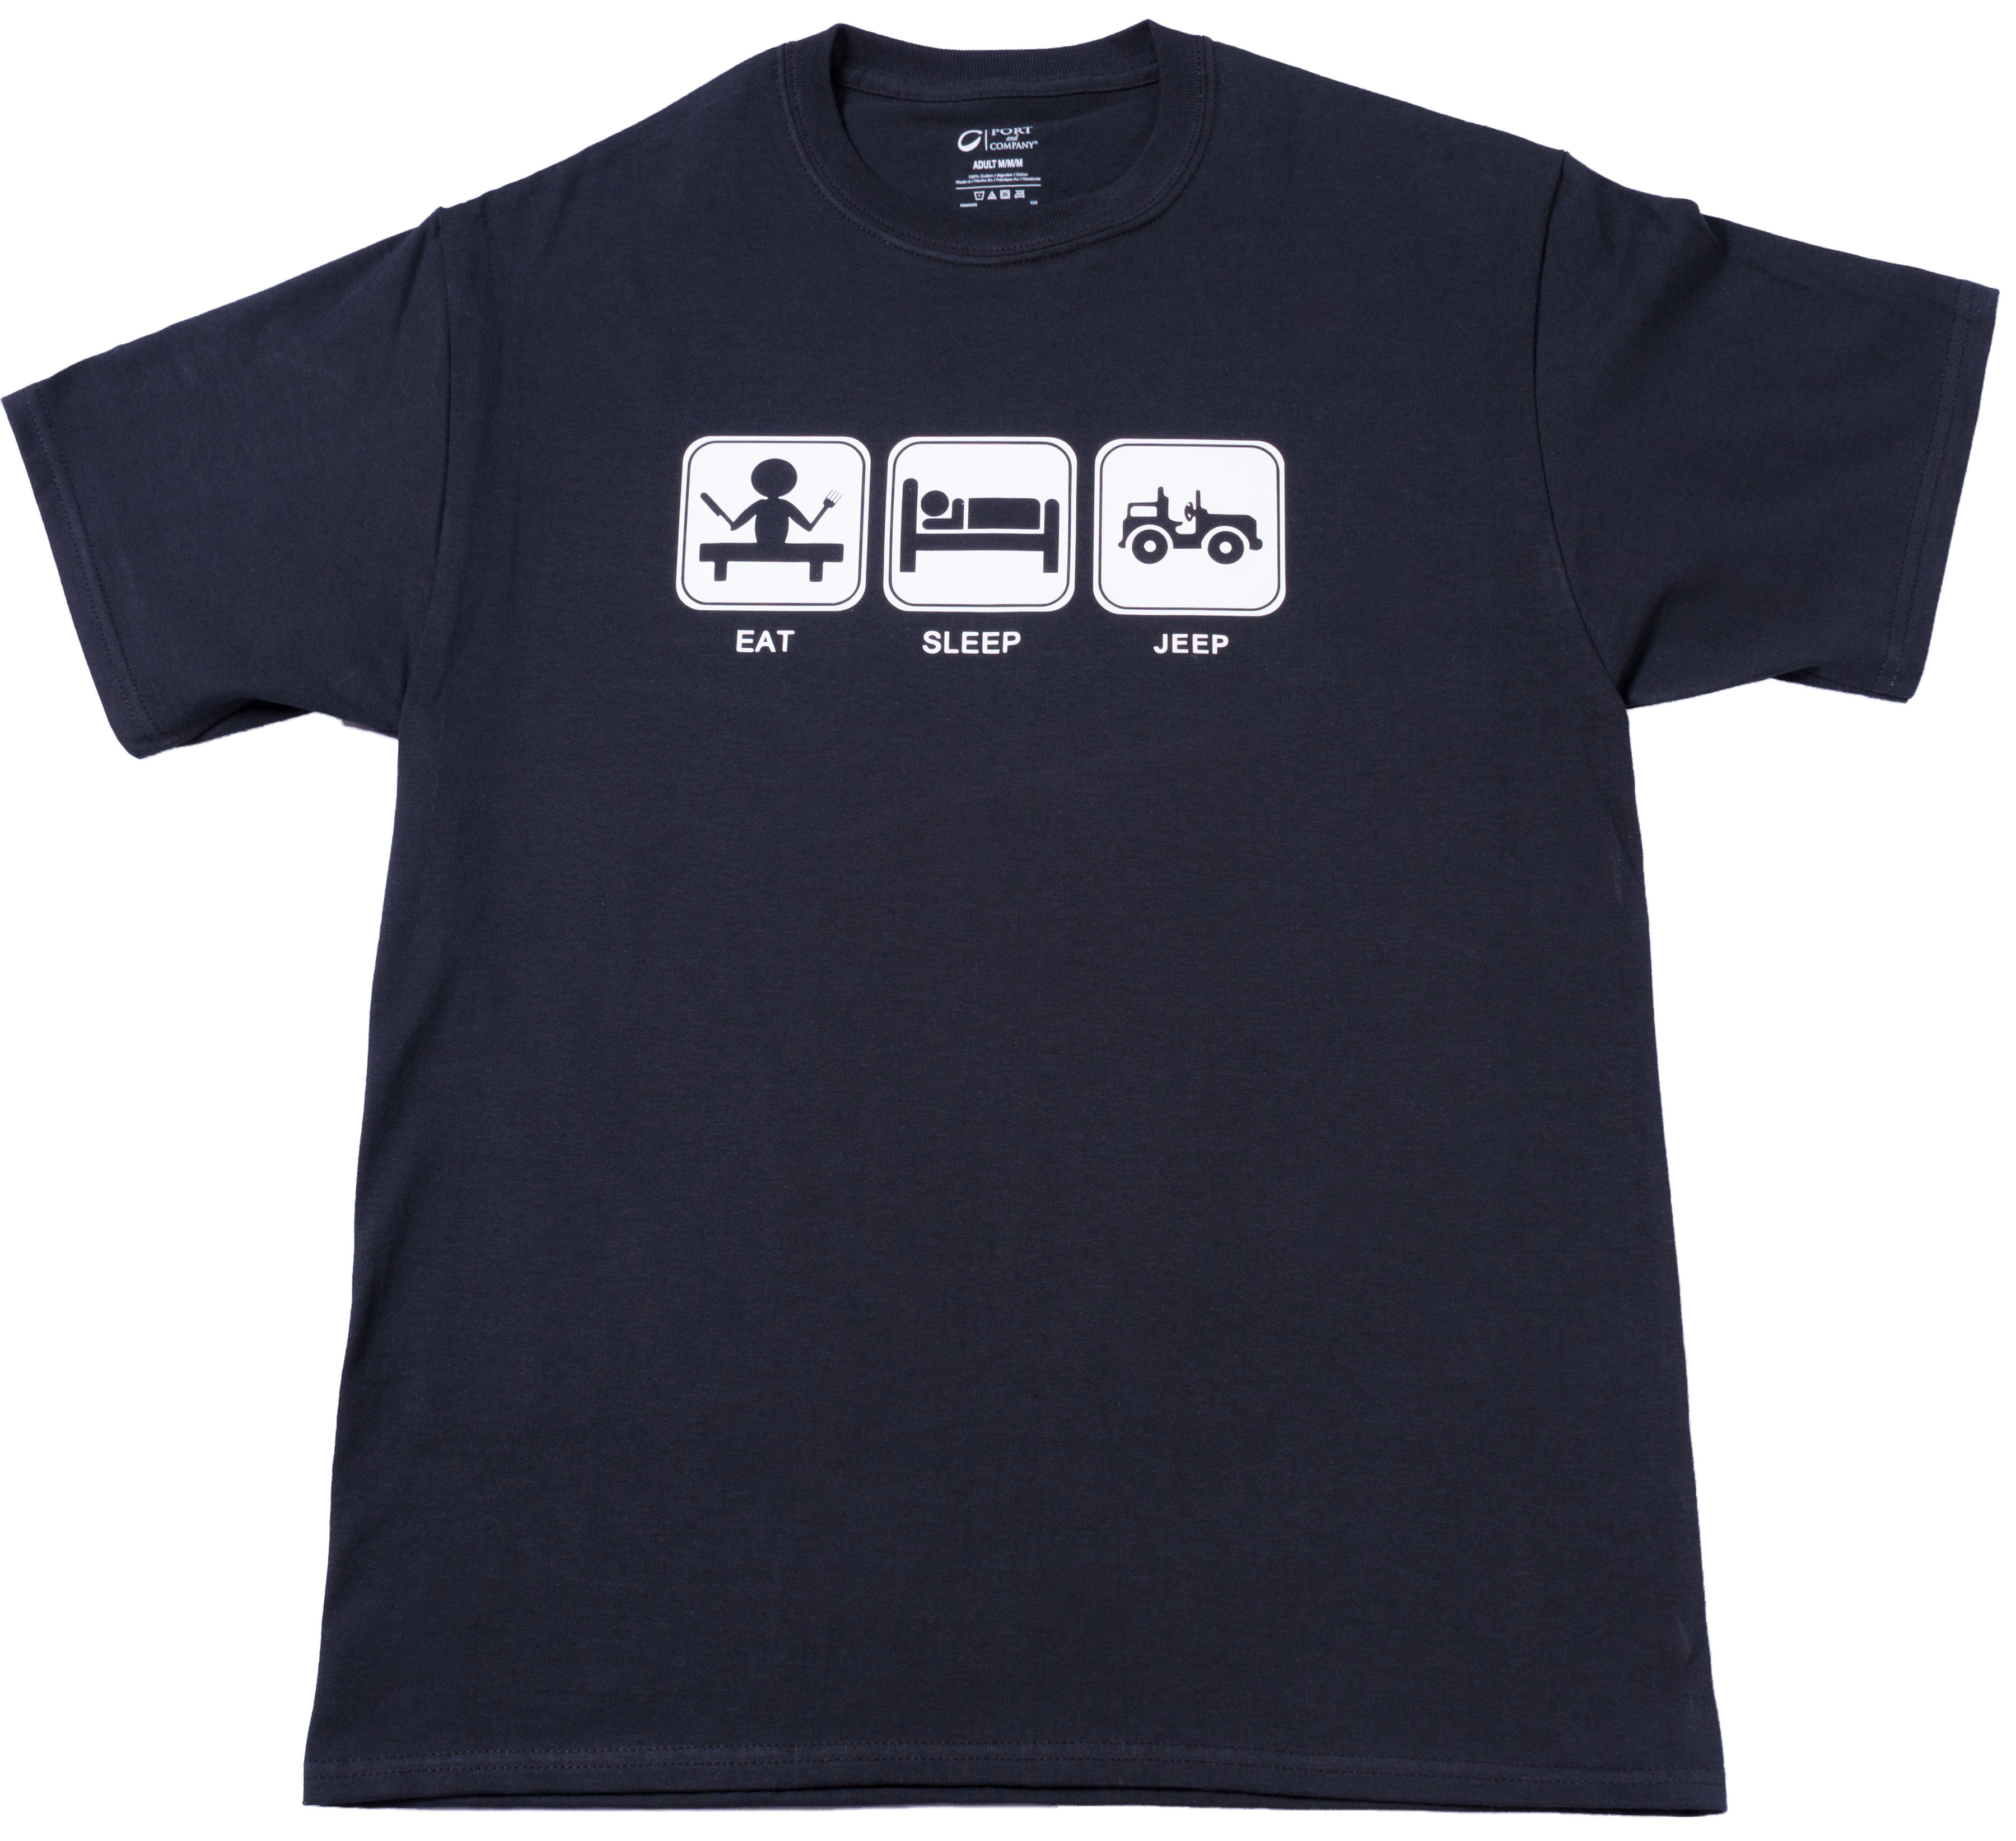 Eat Sleep Jeep T-Shirt · Top Notch Custom Apparel · Online Store